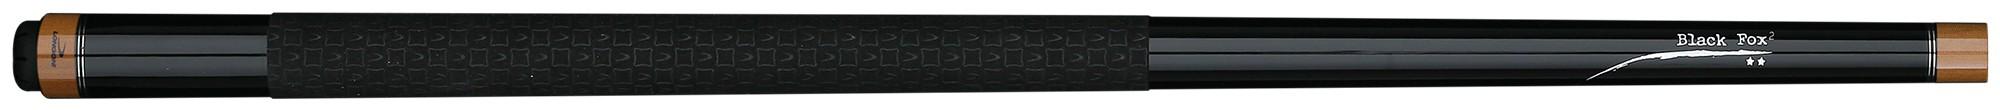 Longoni Black Fox 2 HPG wood** NIEUW MODEL